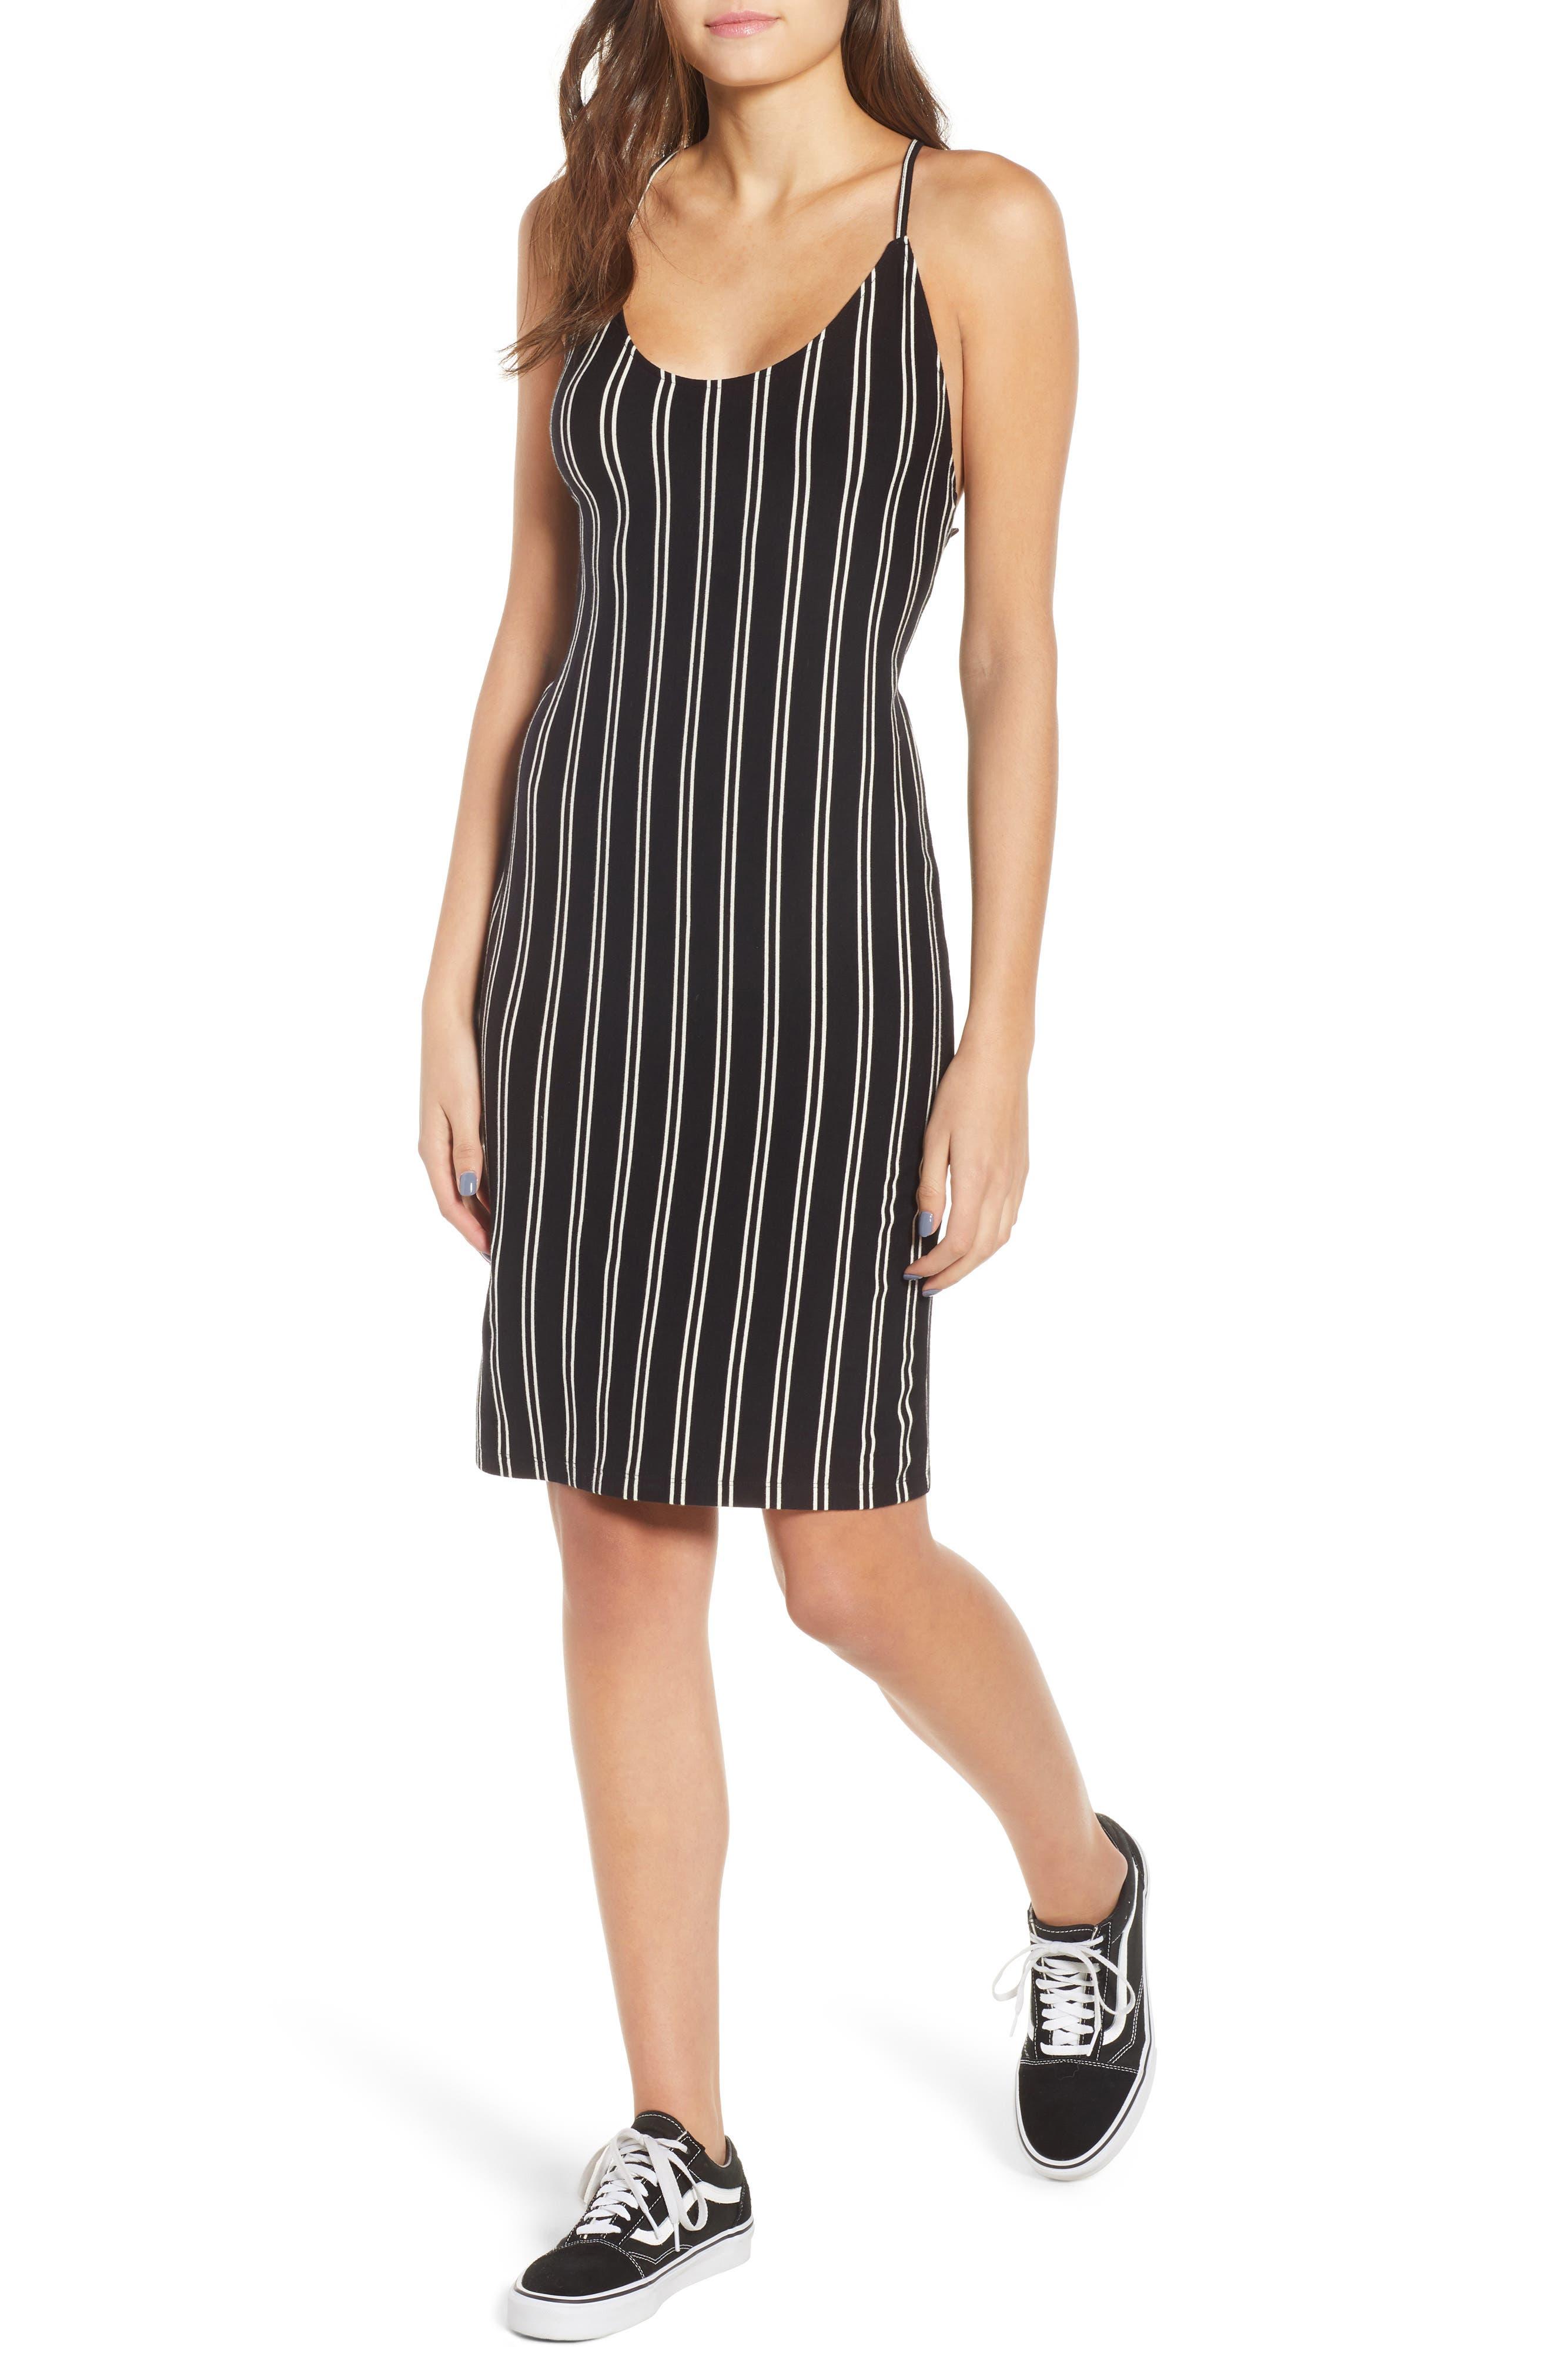 Lockette Strappy Striped Dress,                         Main,                         color, Jet Black Multi